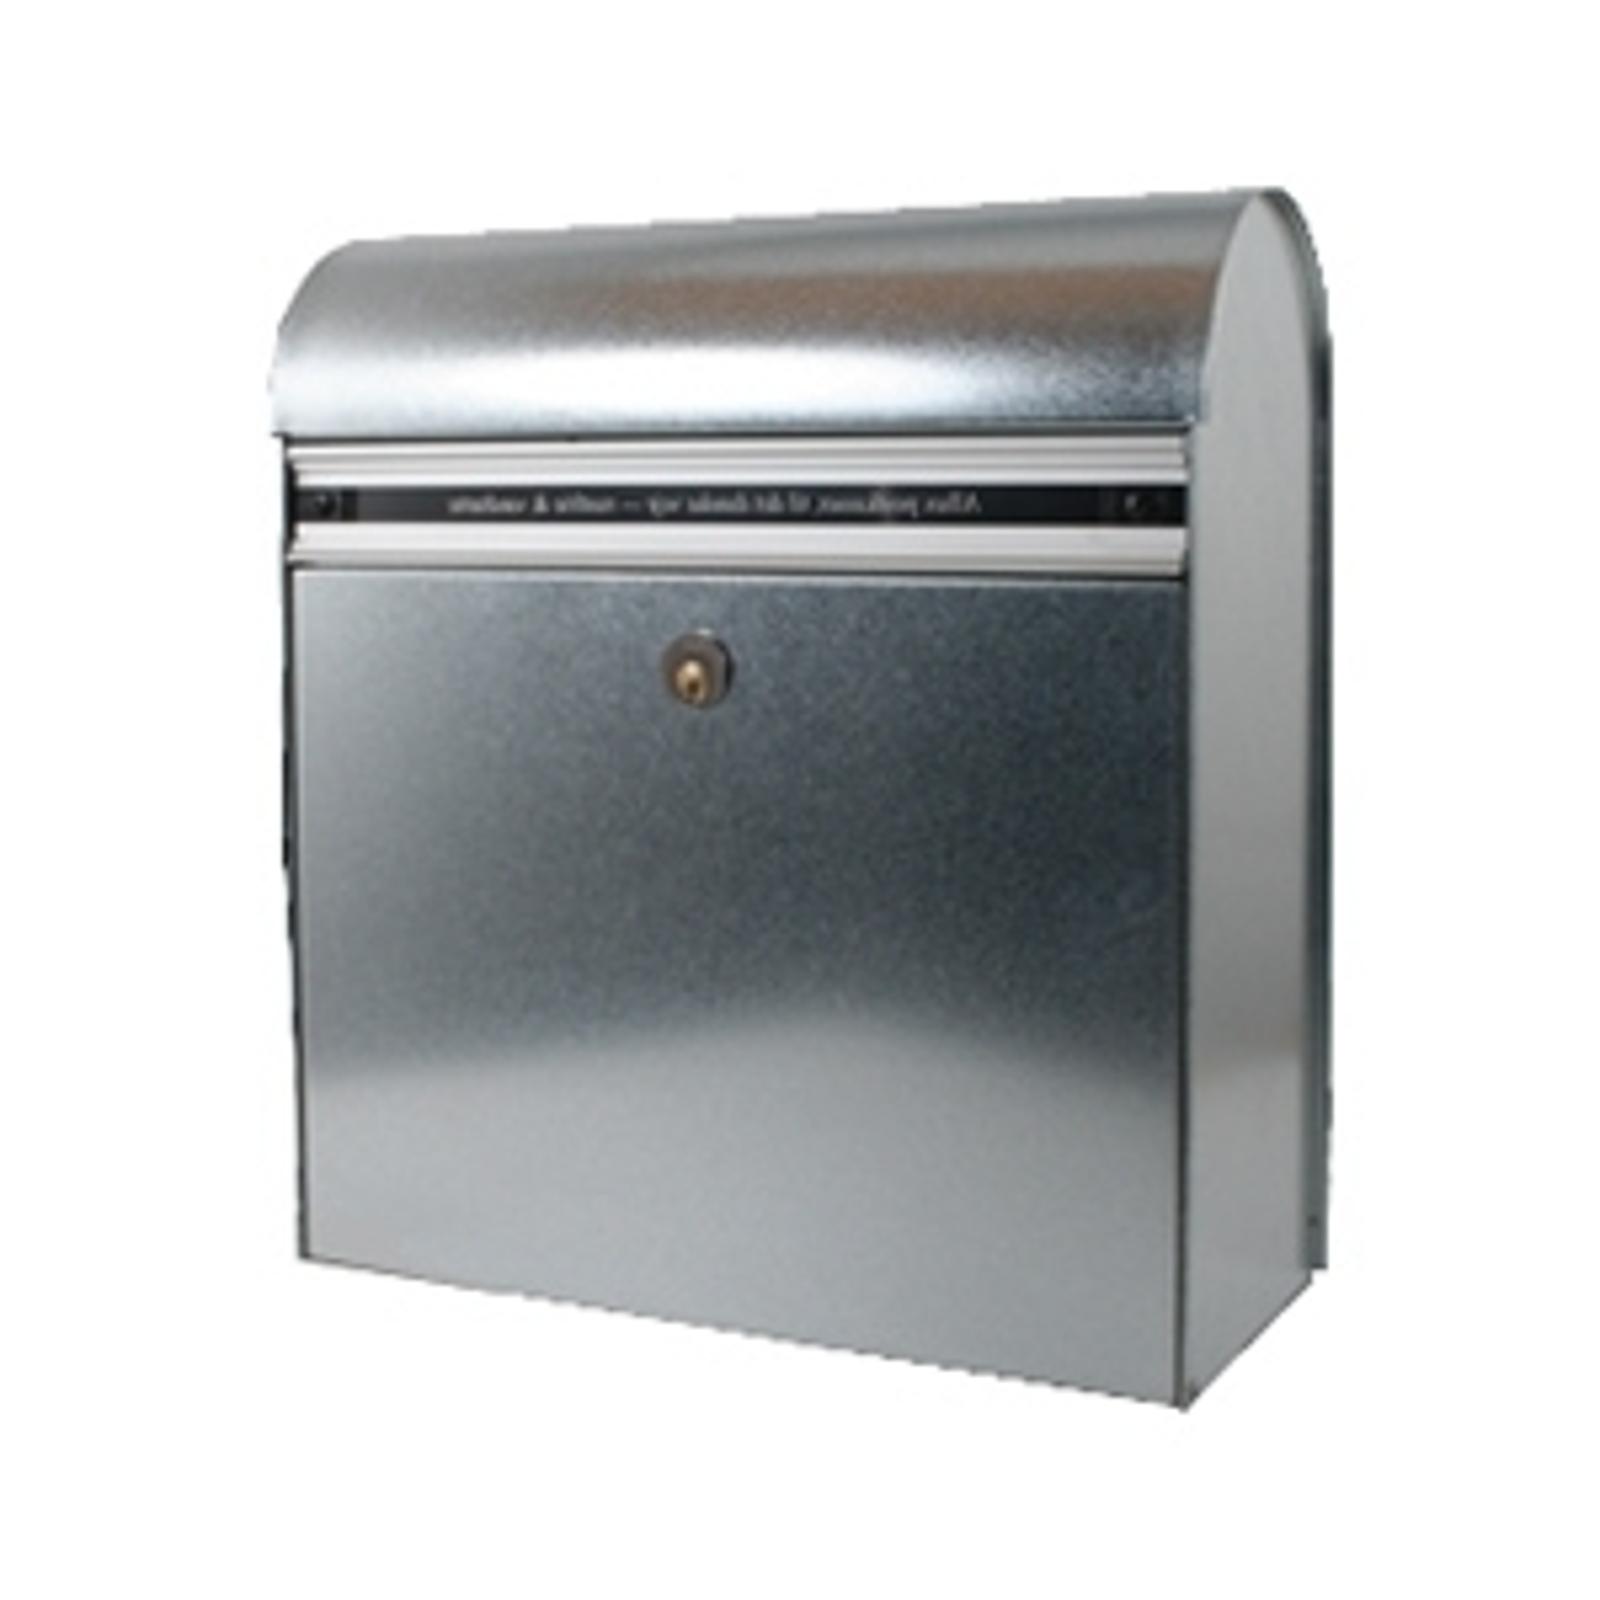 Buzón robusto KS200, acero